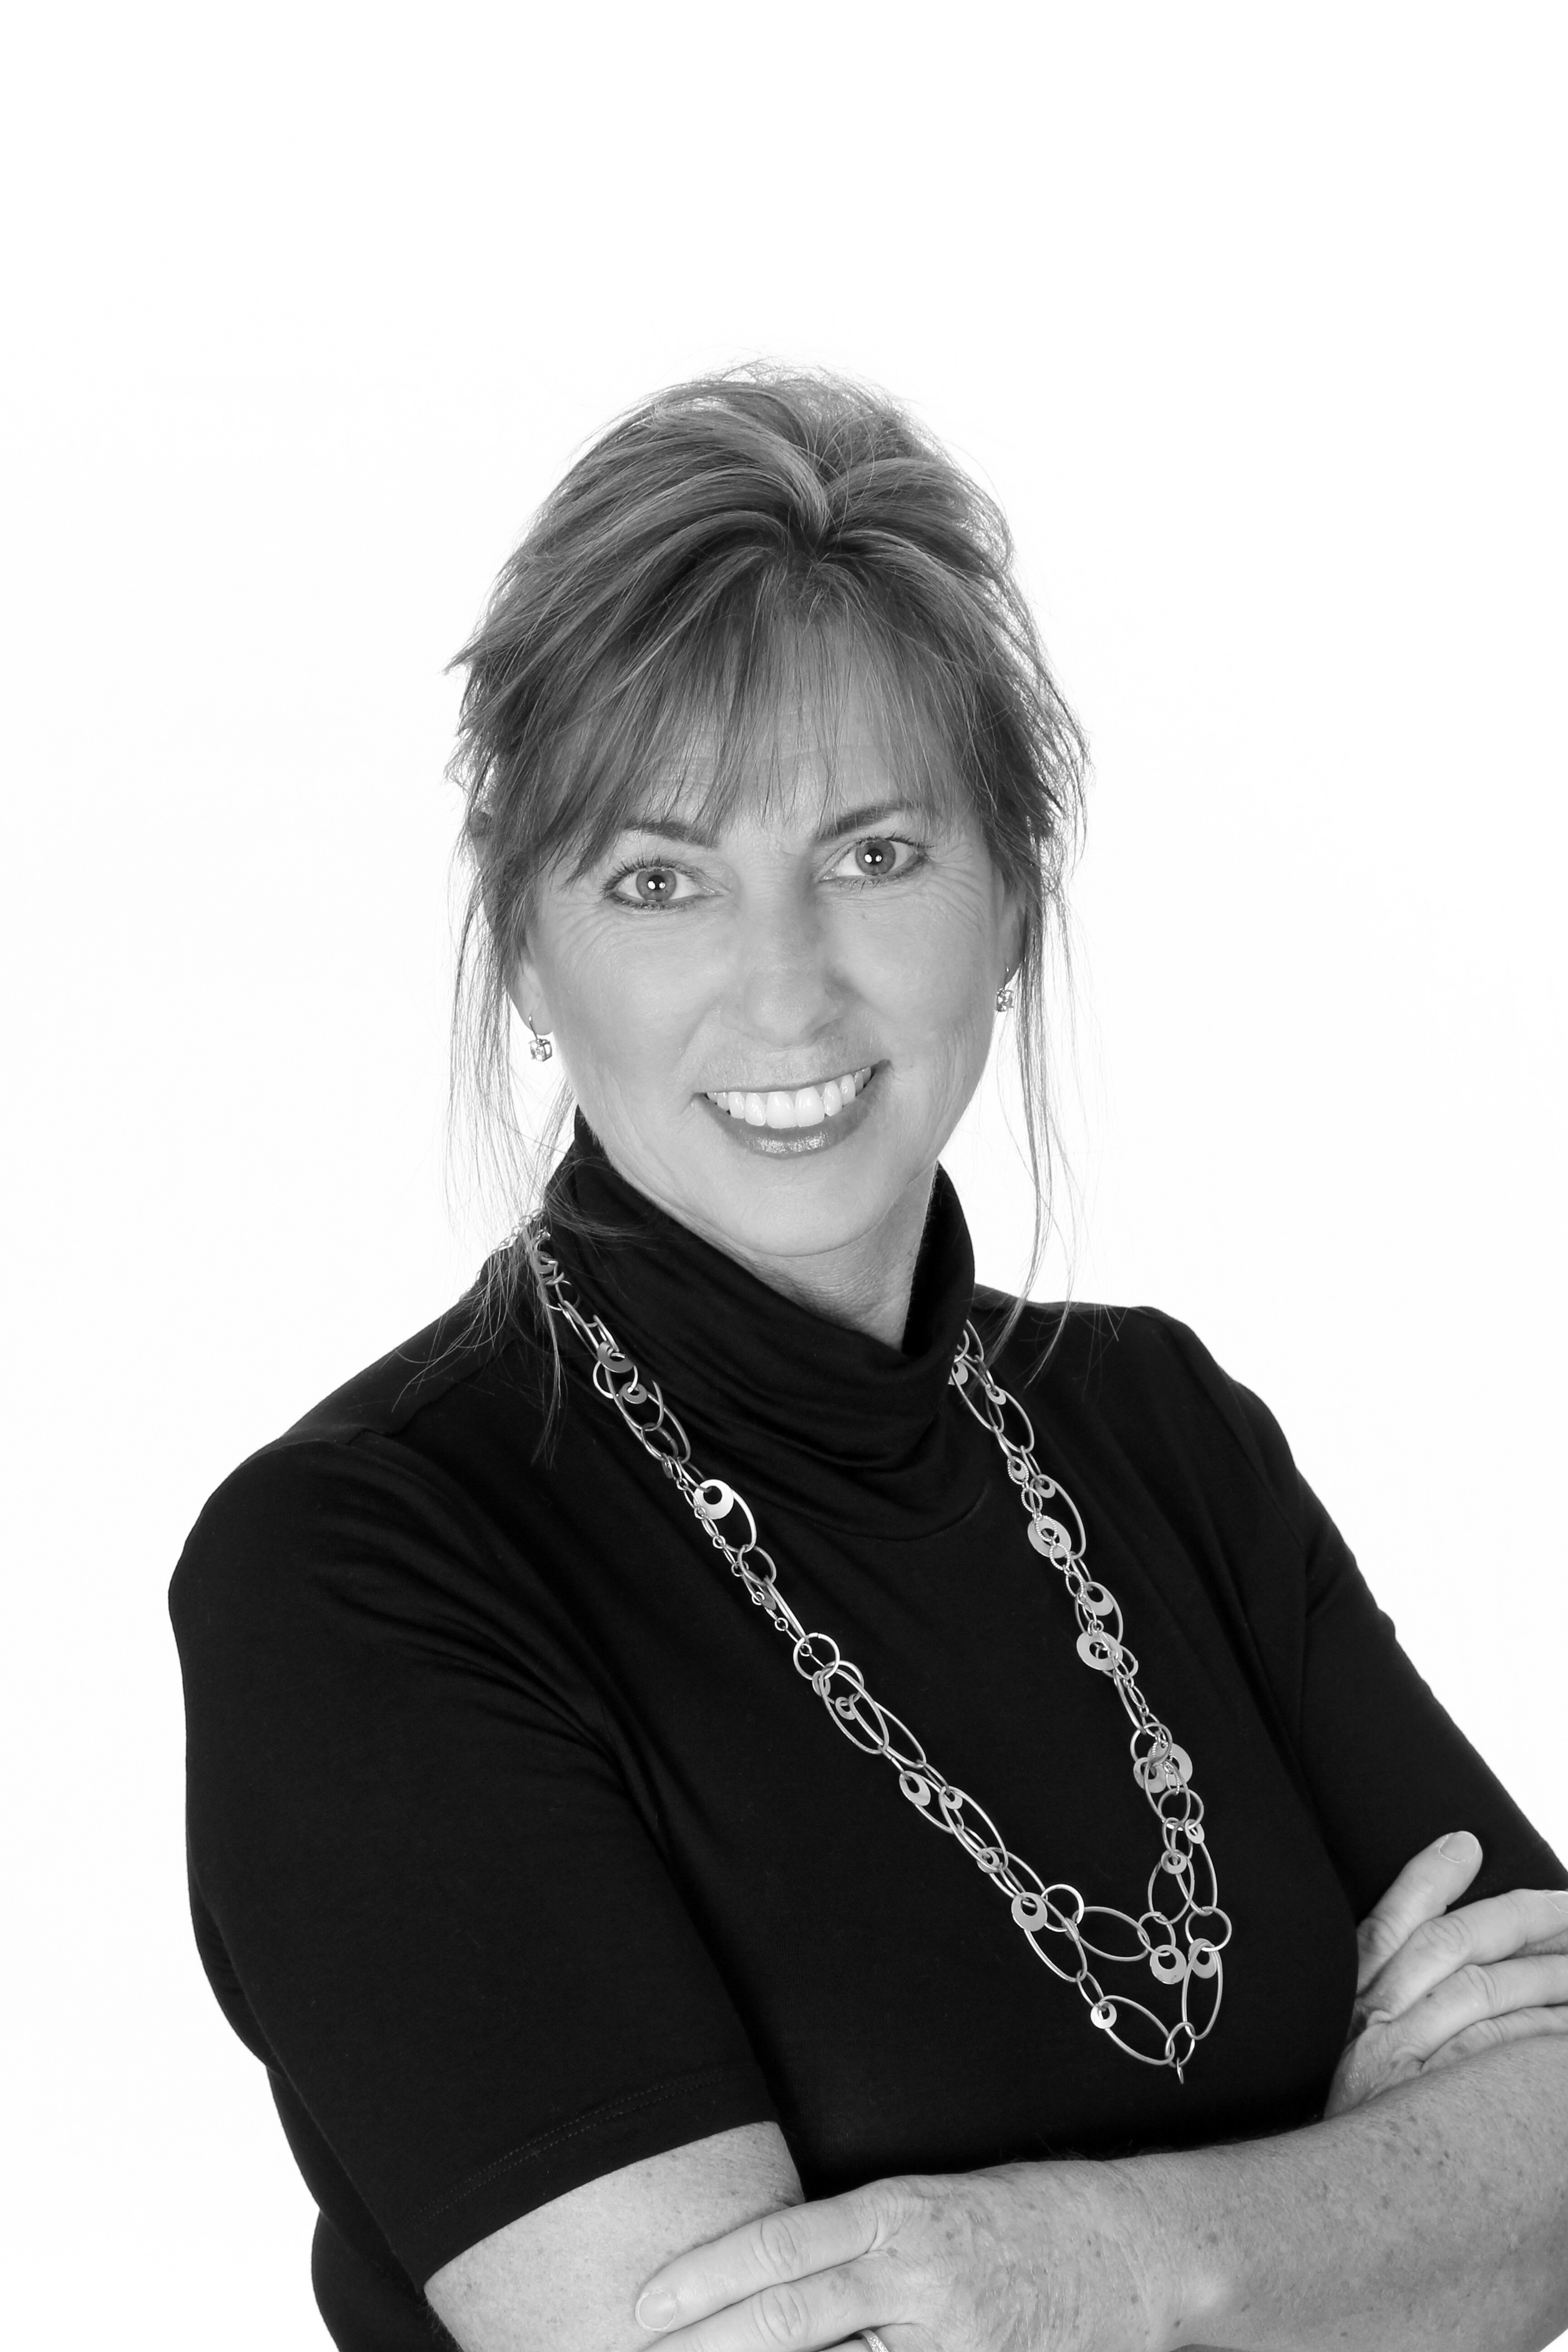 Angela Renn